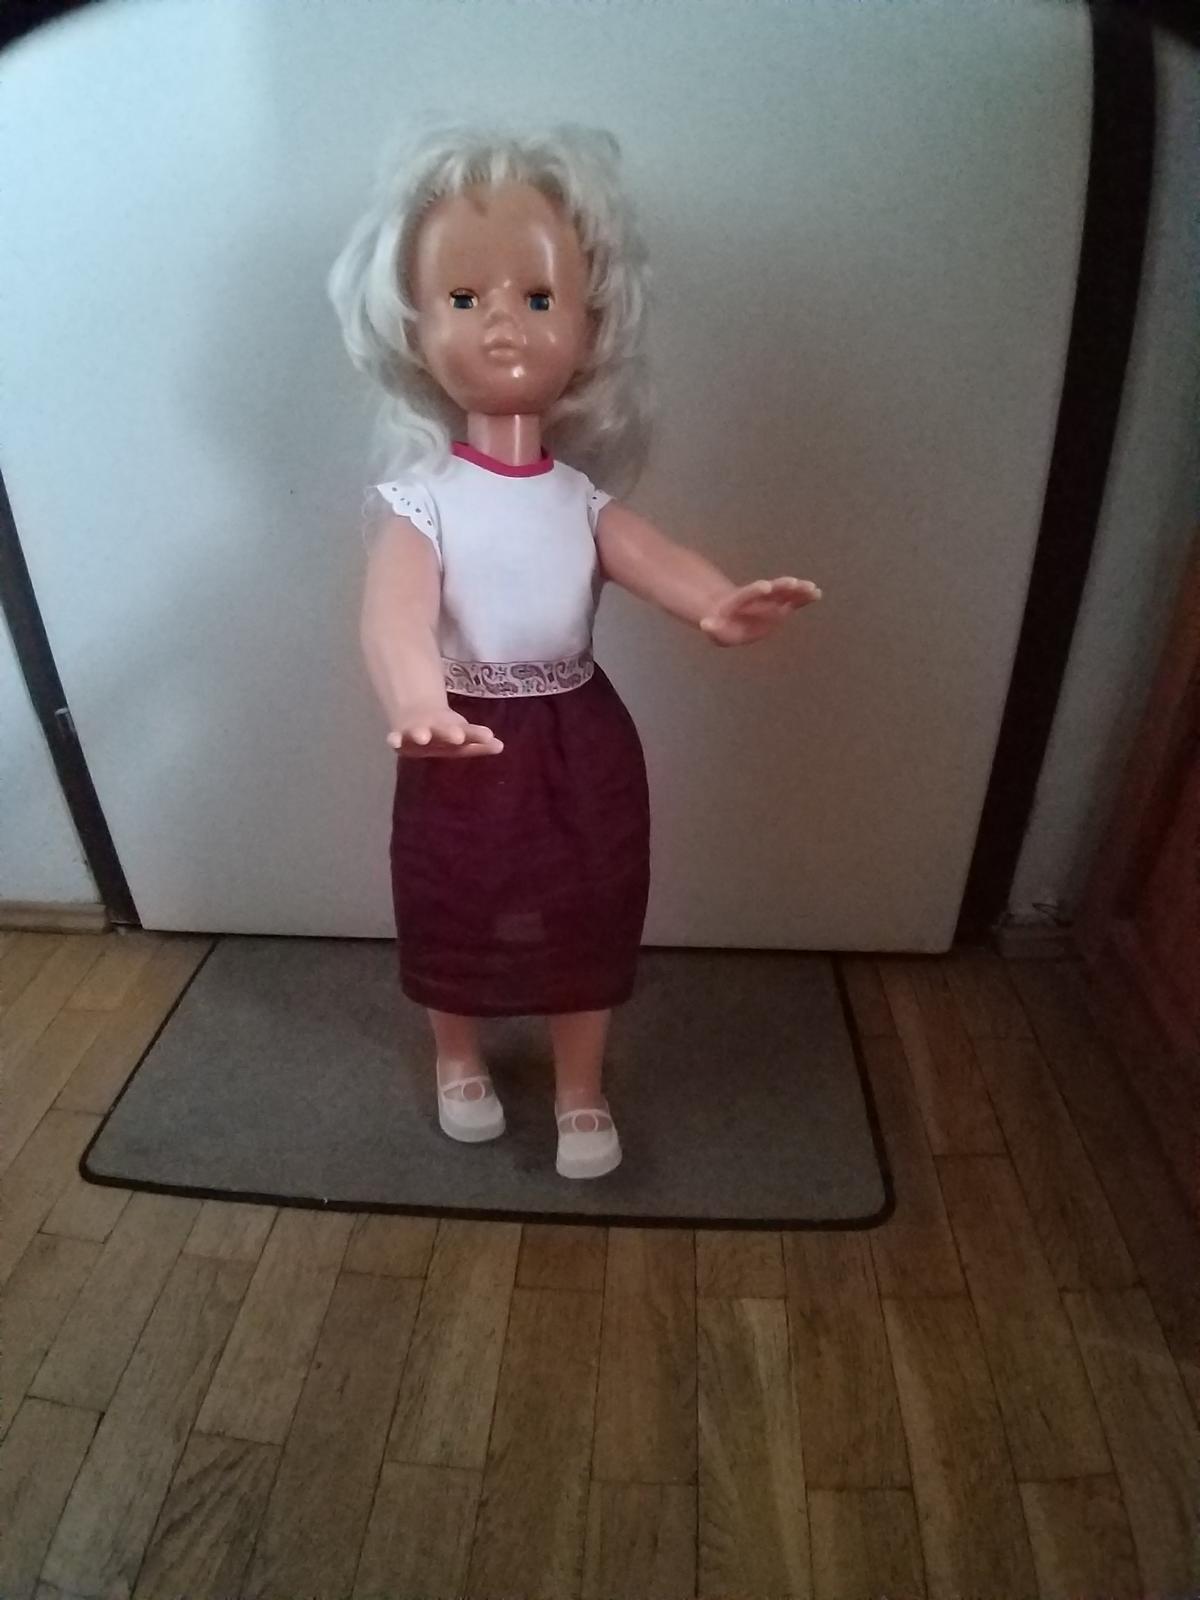 Stará ruská bábika - Obrázok č. 1